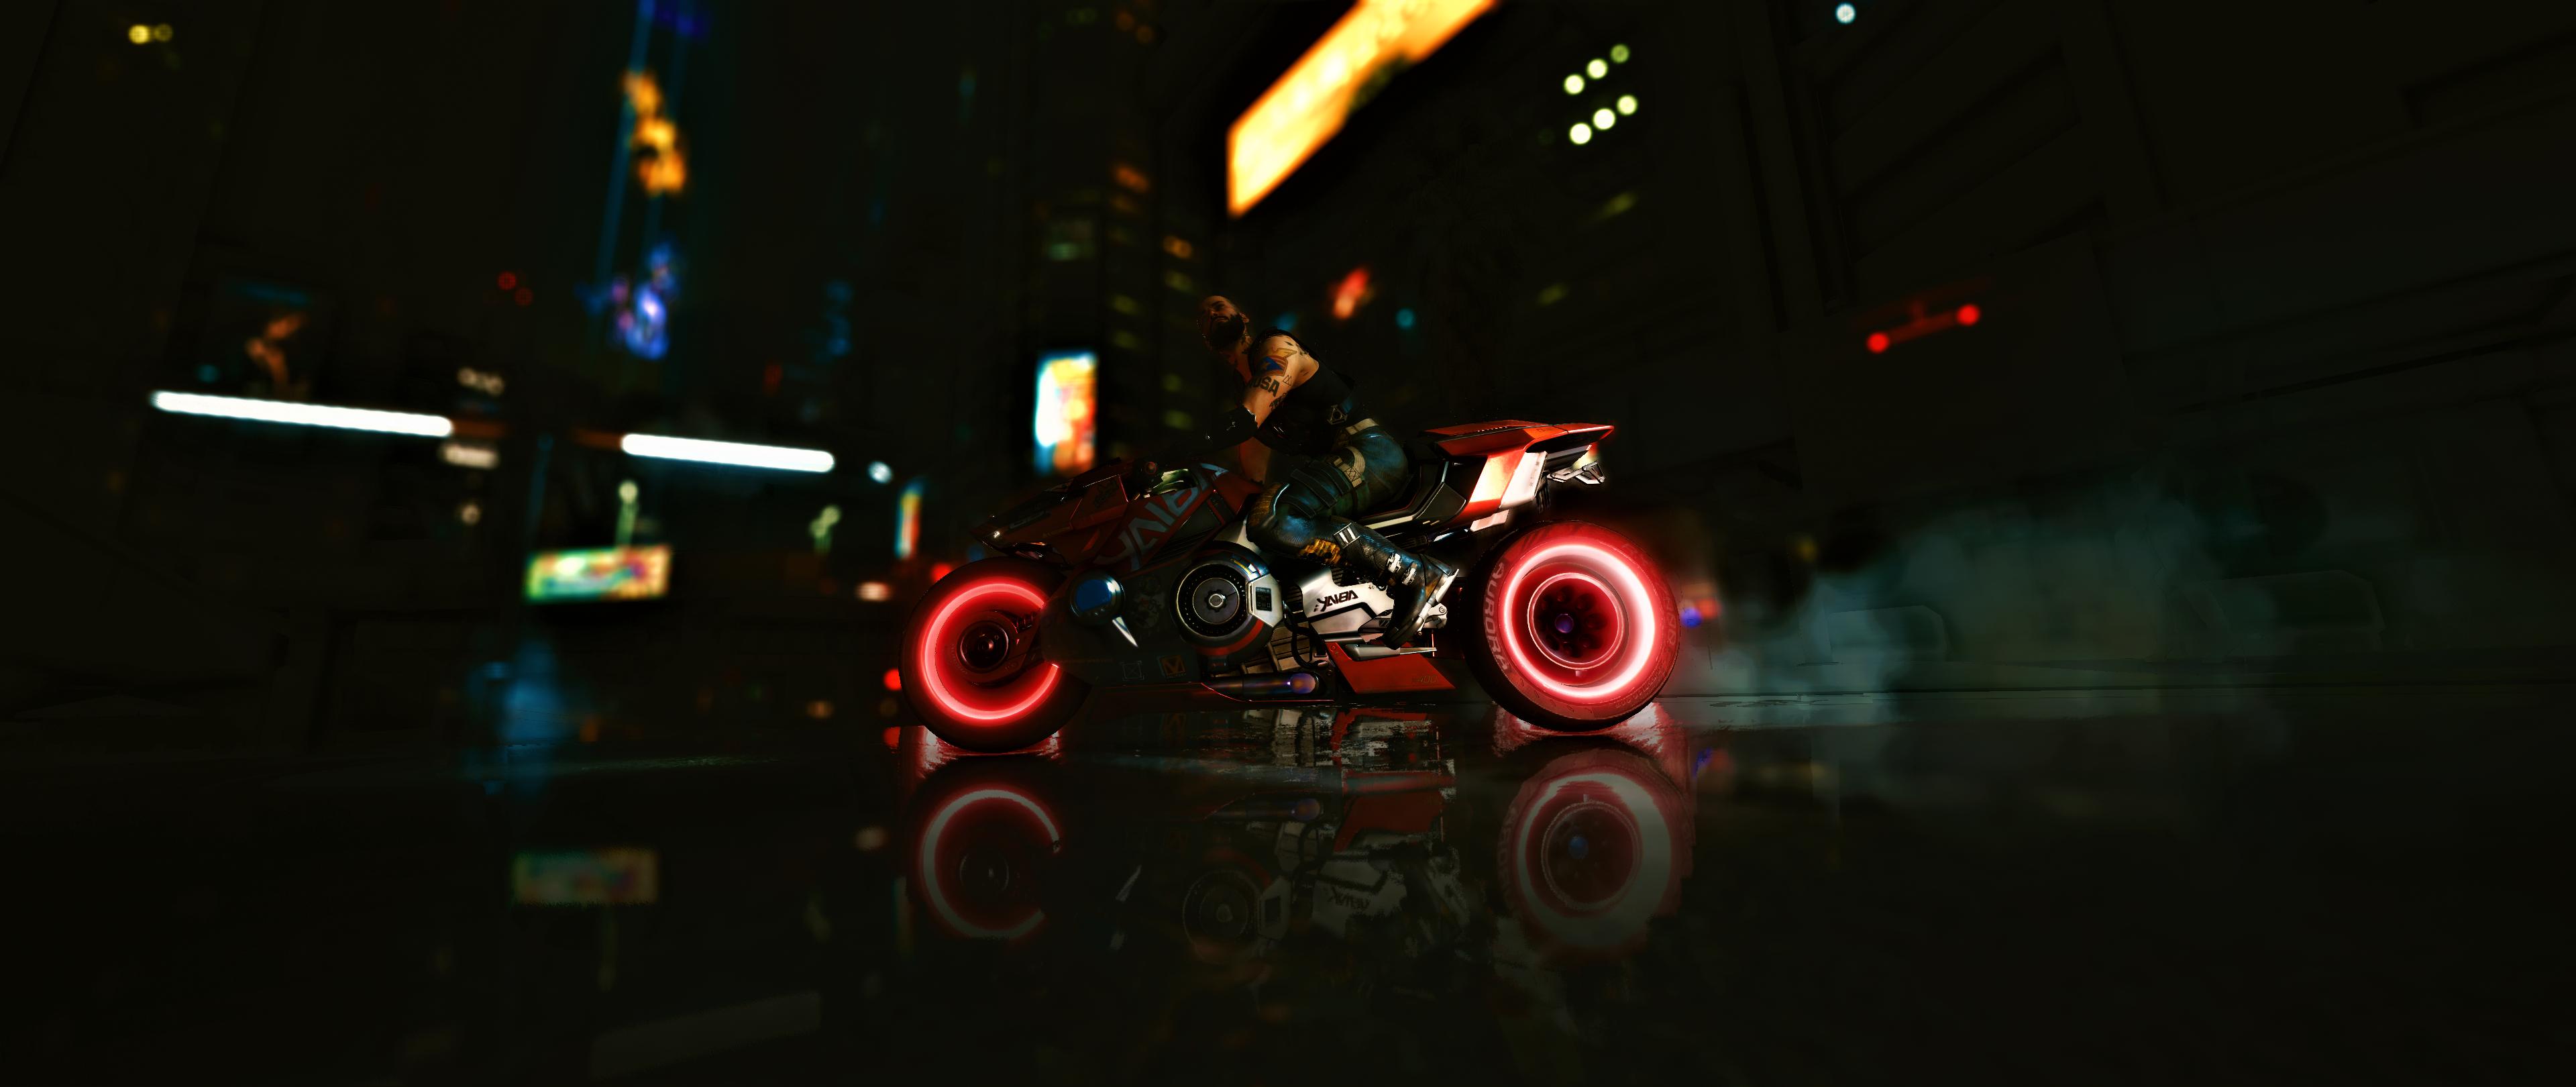 Cyberpunk 2077 Screenshot 2021.05.05 - 23.40.49.66.png - Cyberpunk 2077